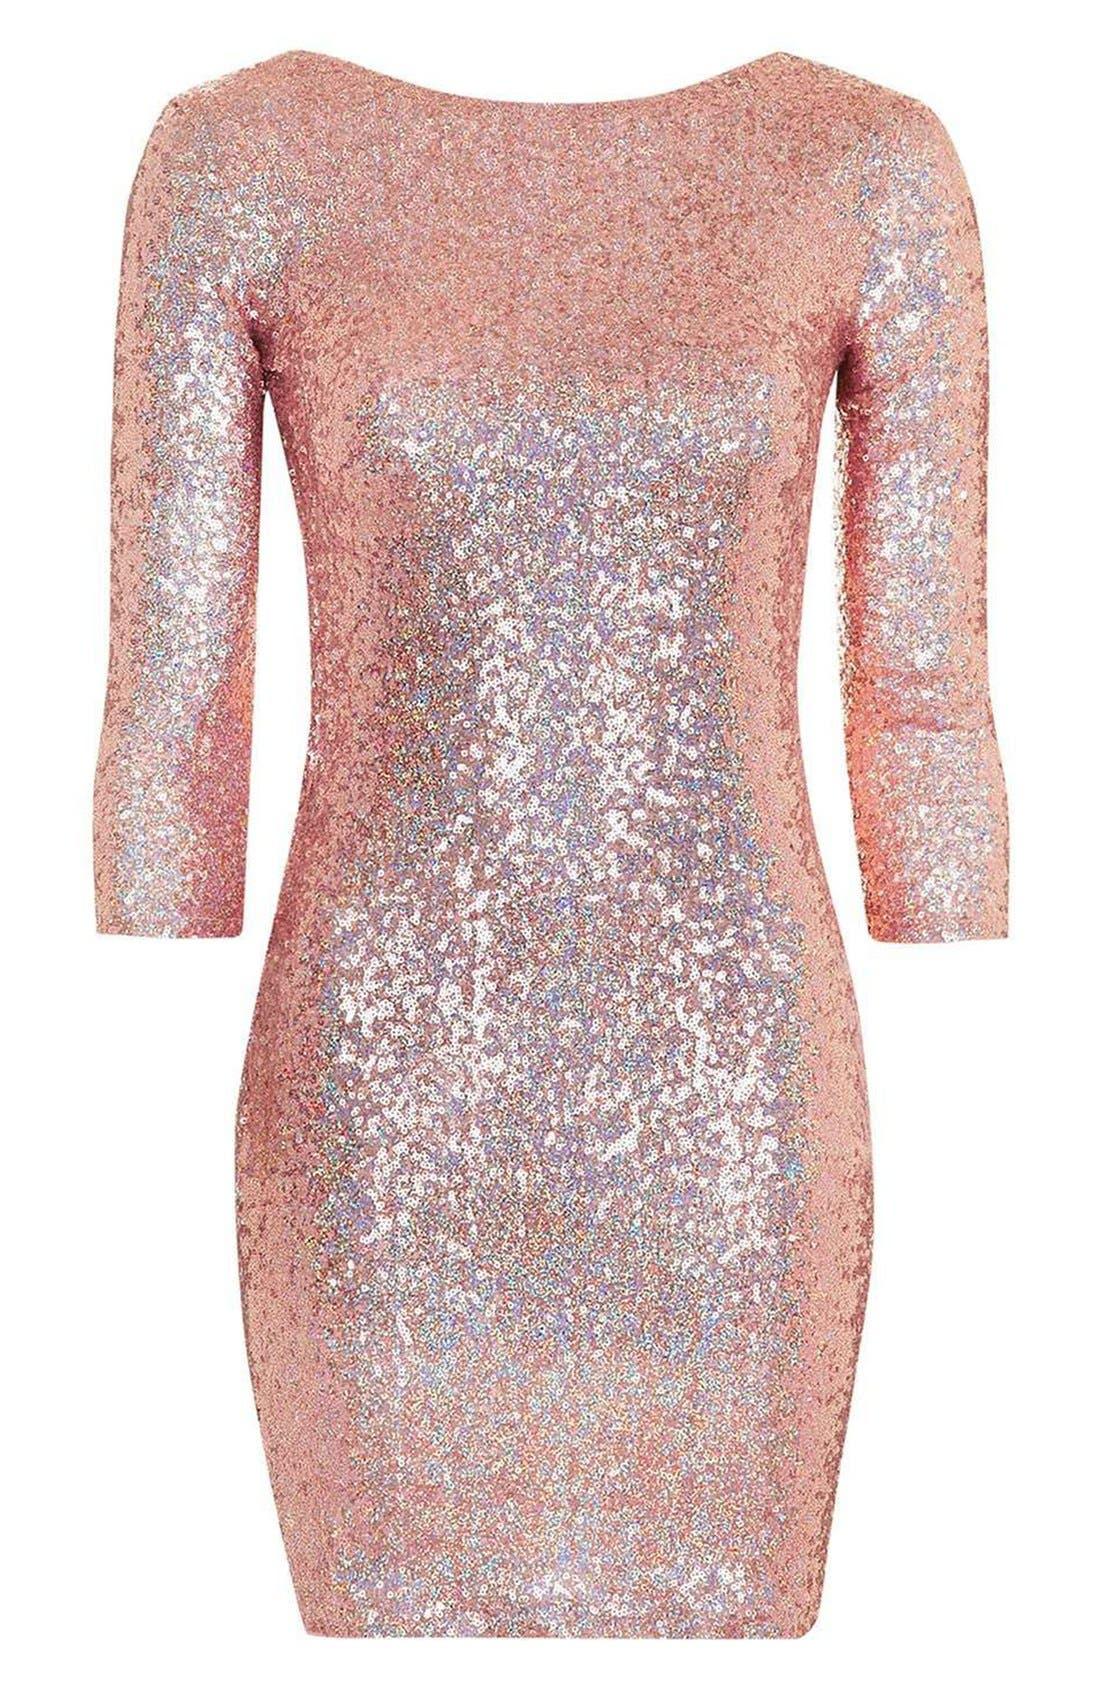 Sequin Body-Con Minidress,                             Alternate thumbnail 4, color,